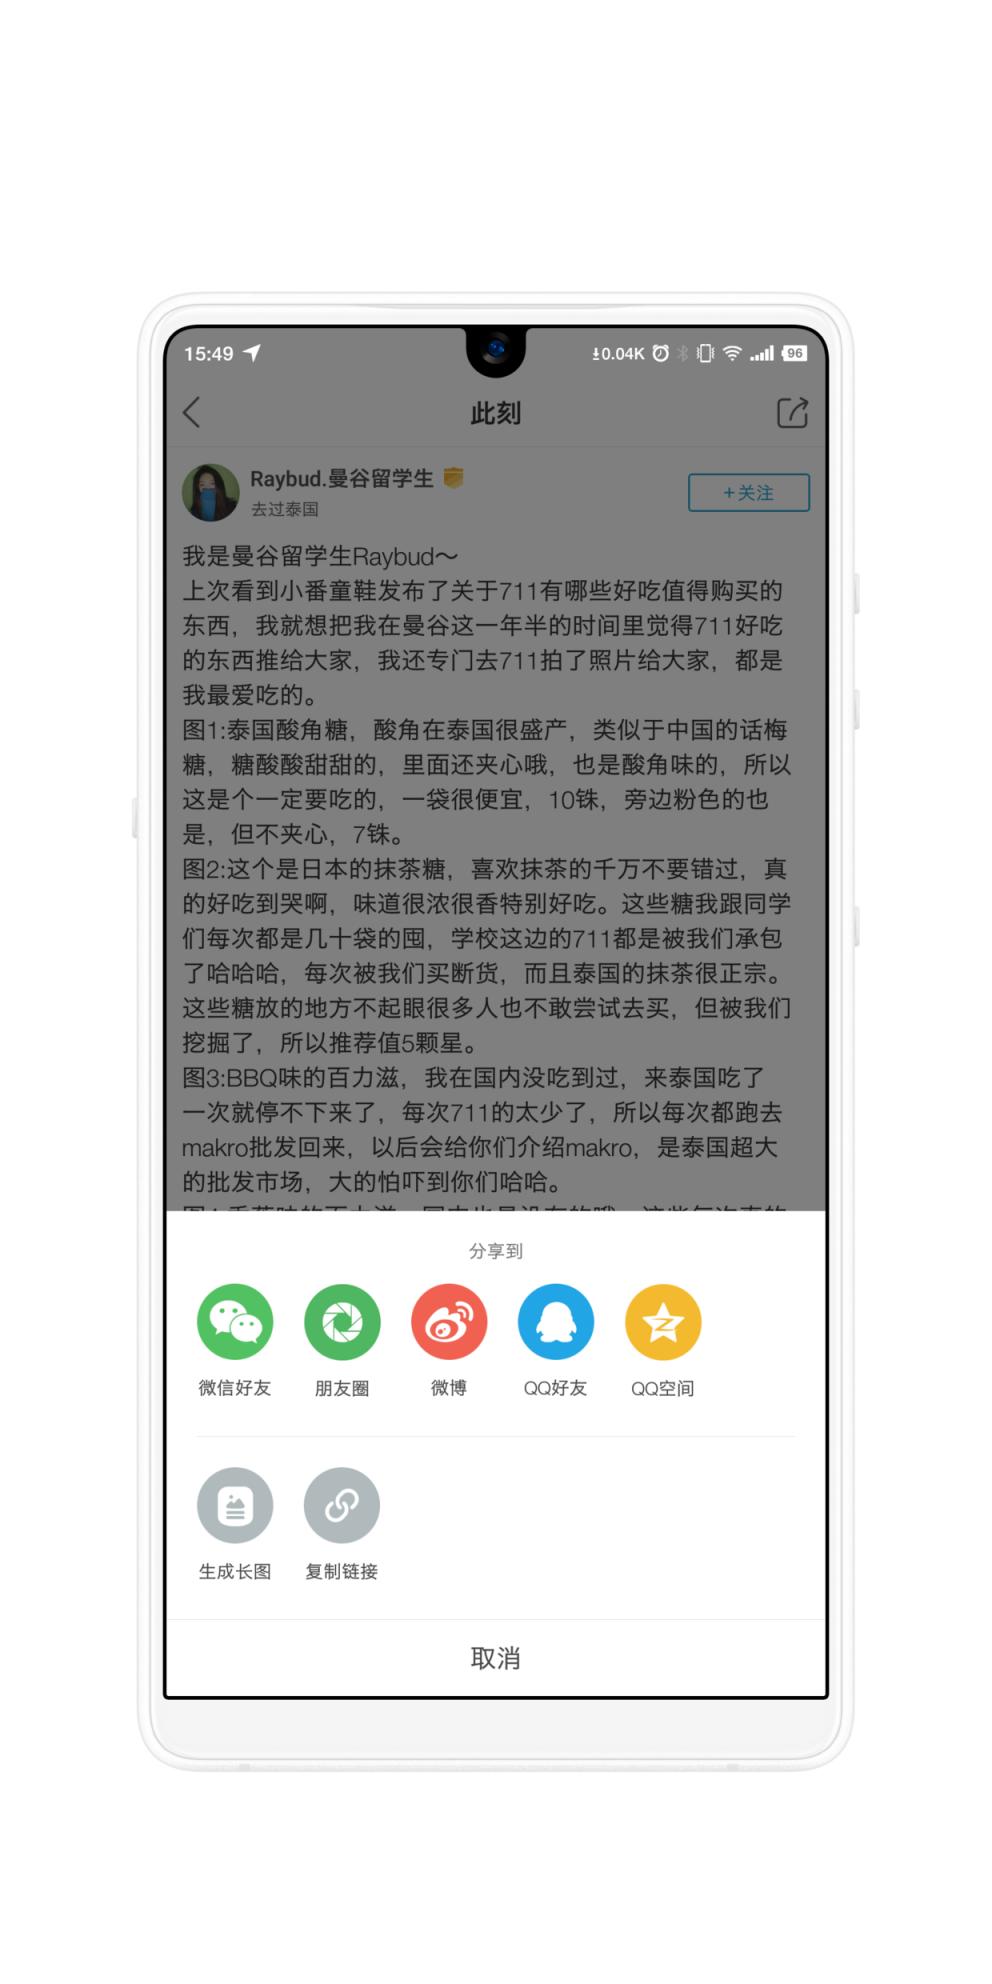 Android 后台进行长图的生成并分享(非长截图)源码